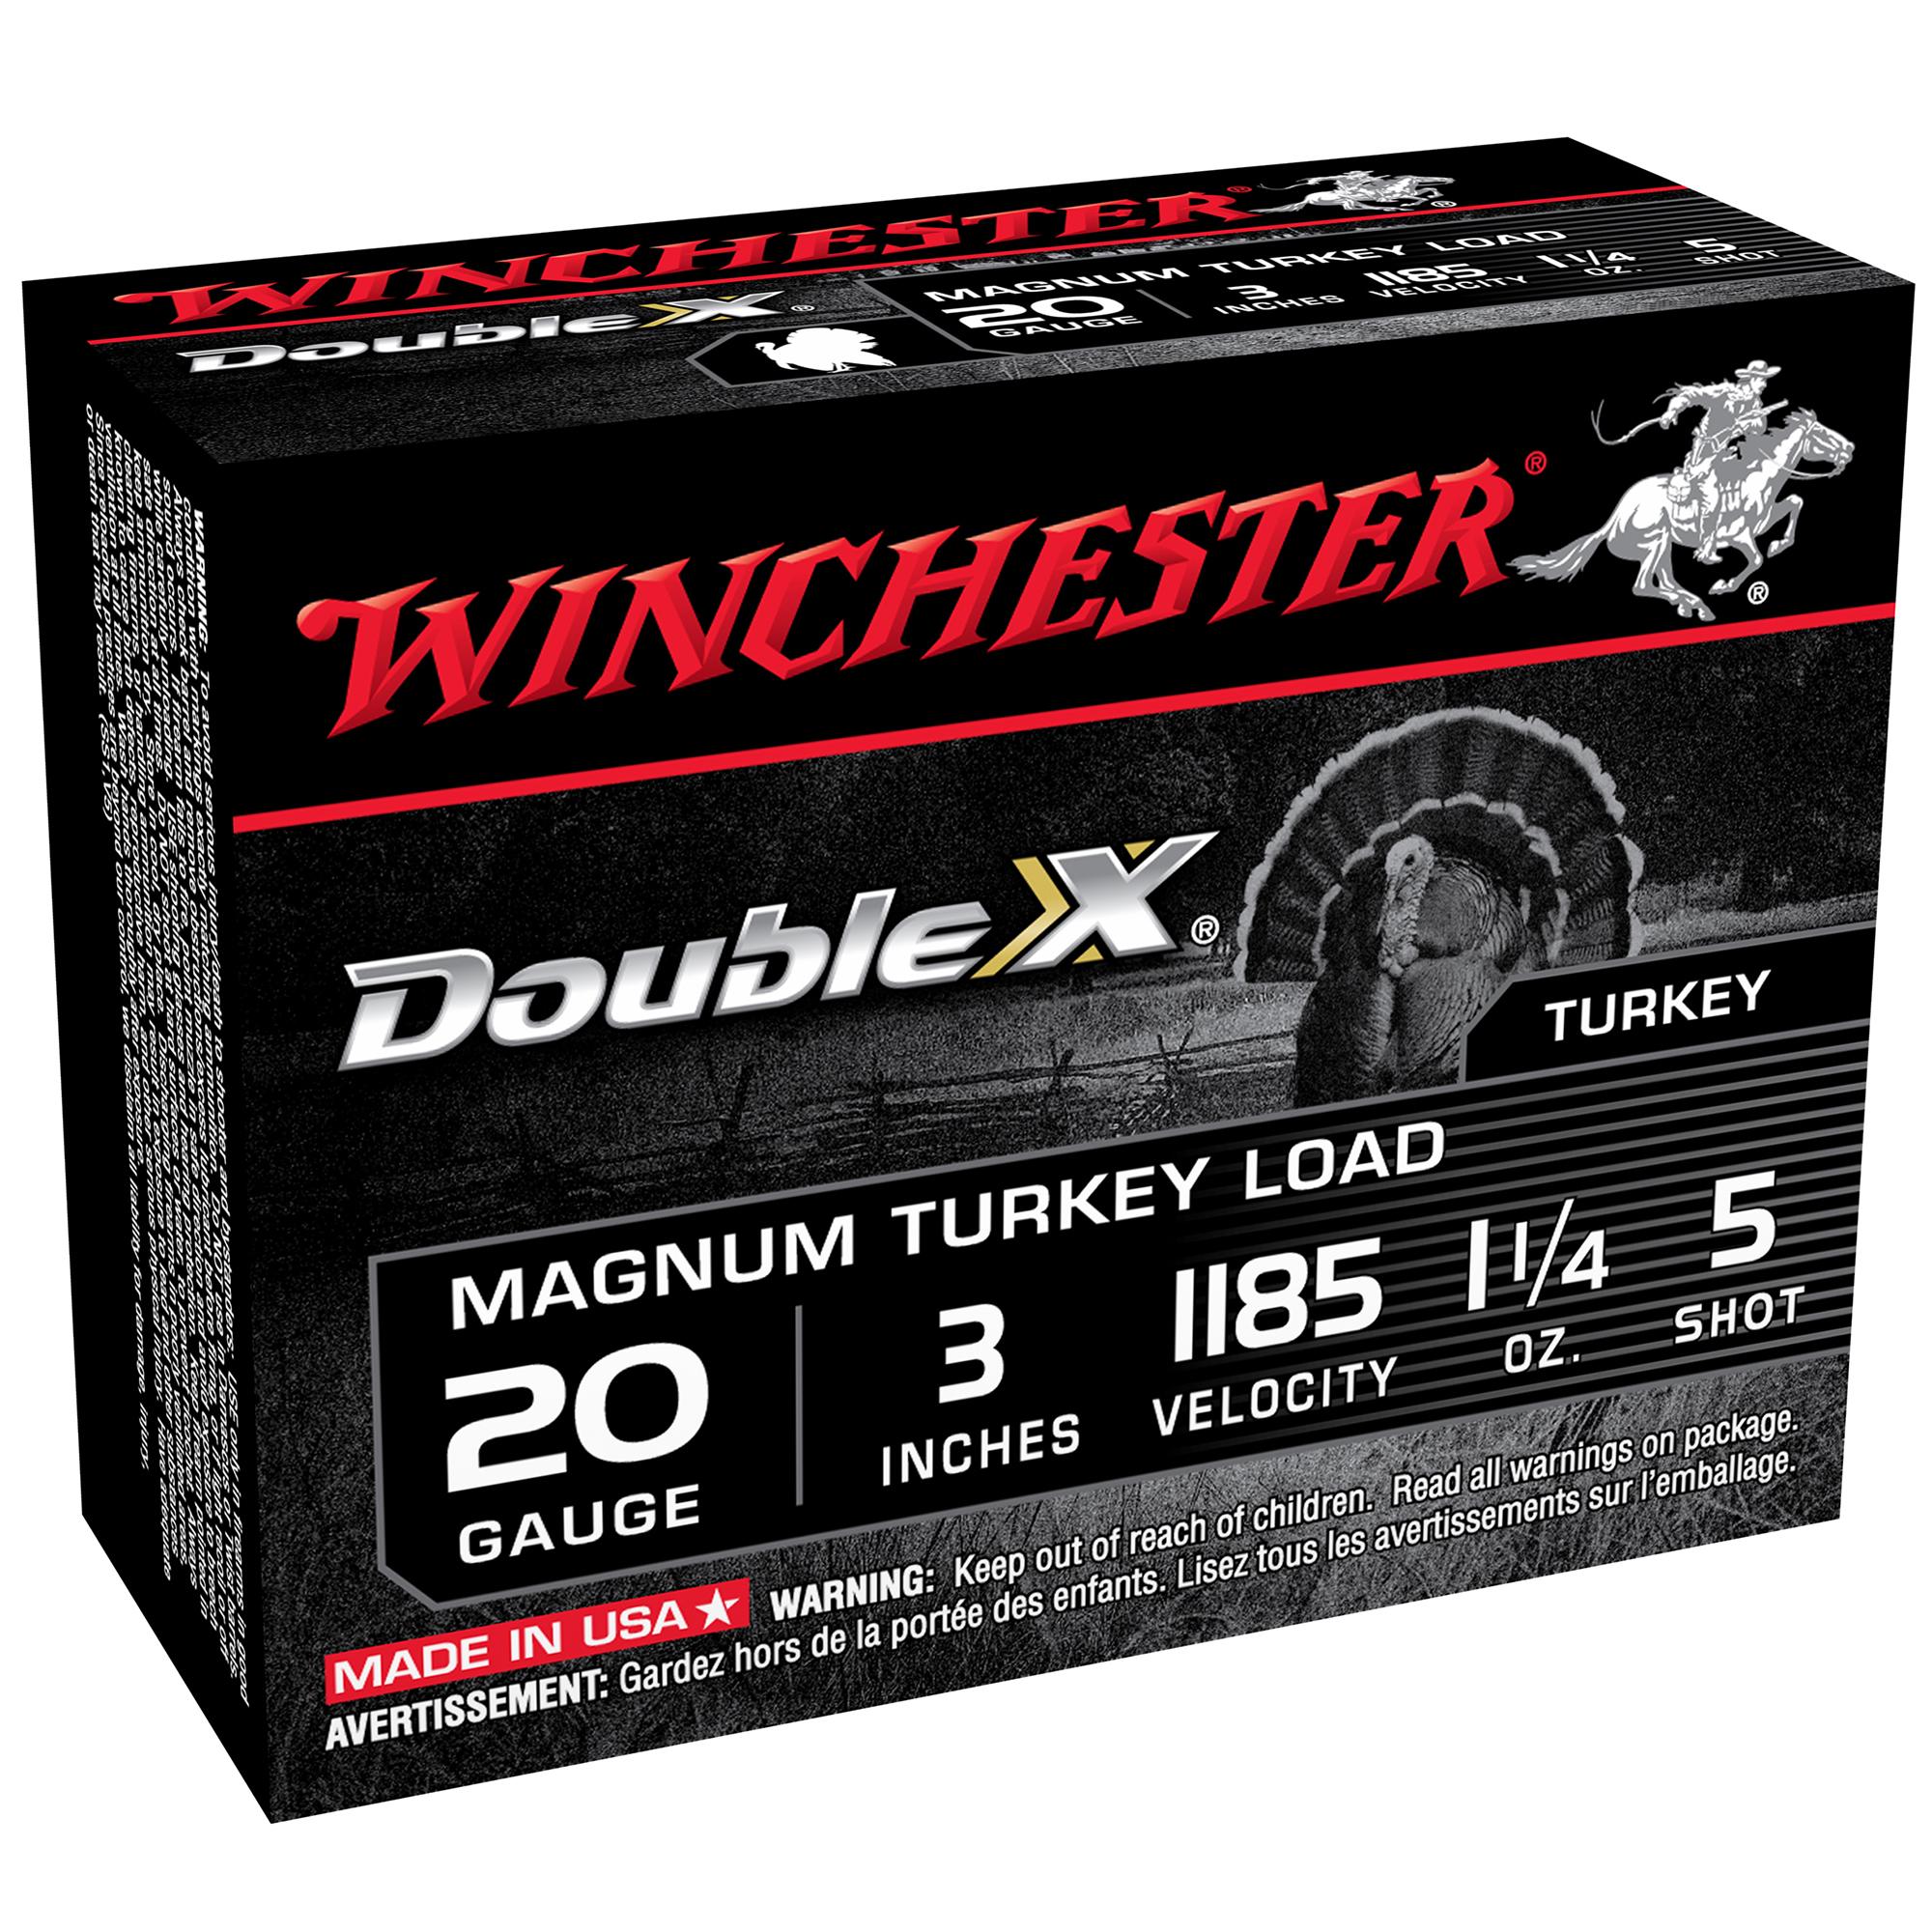 Winchester Double X Turkey Loads, 20-ga, 3″, 1-1/4 oz, #5